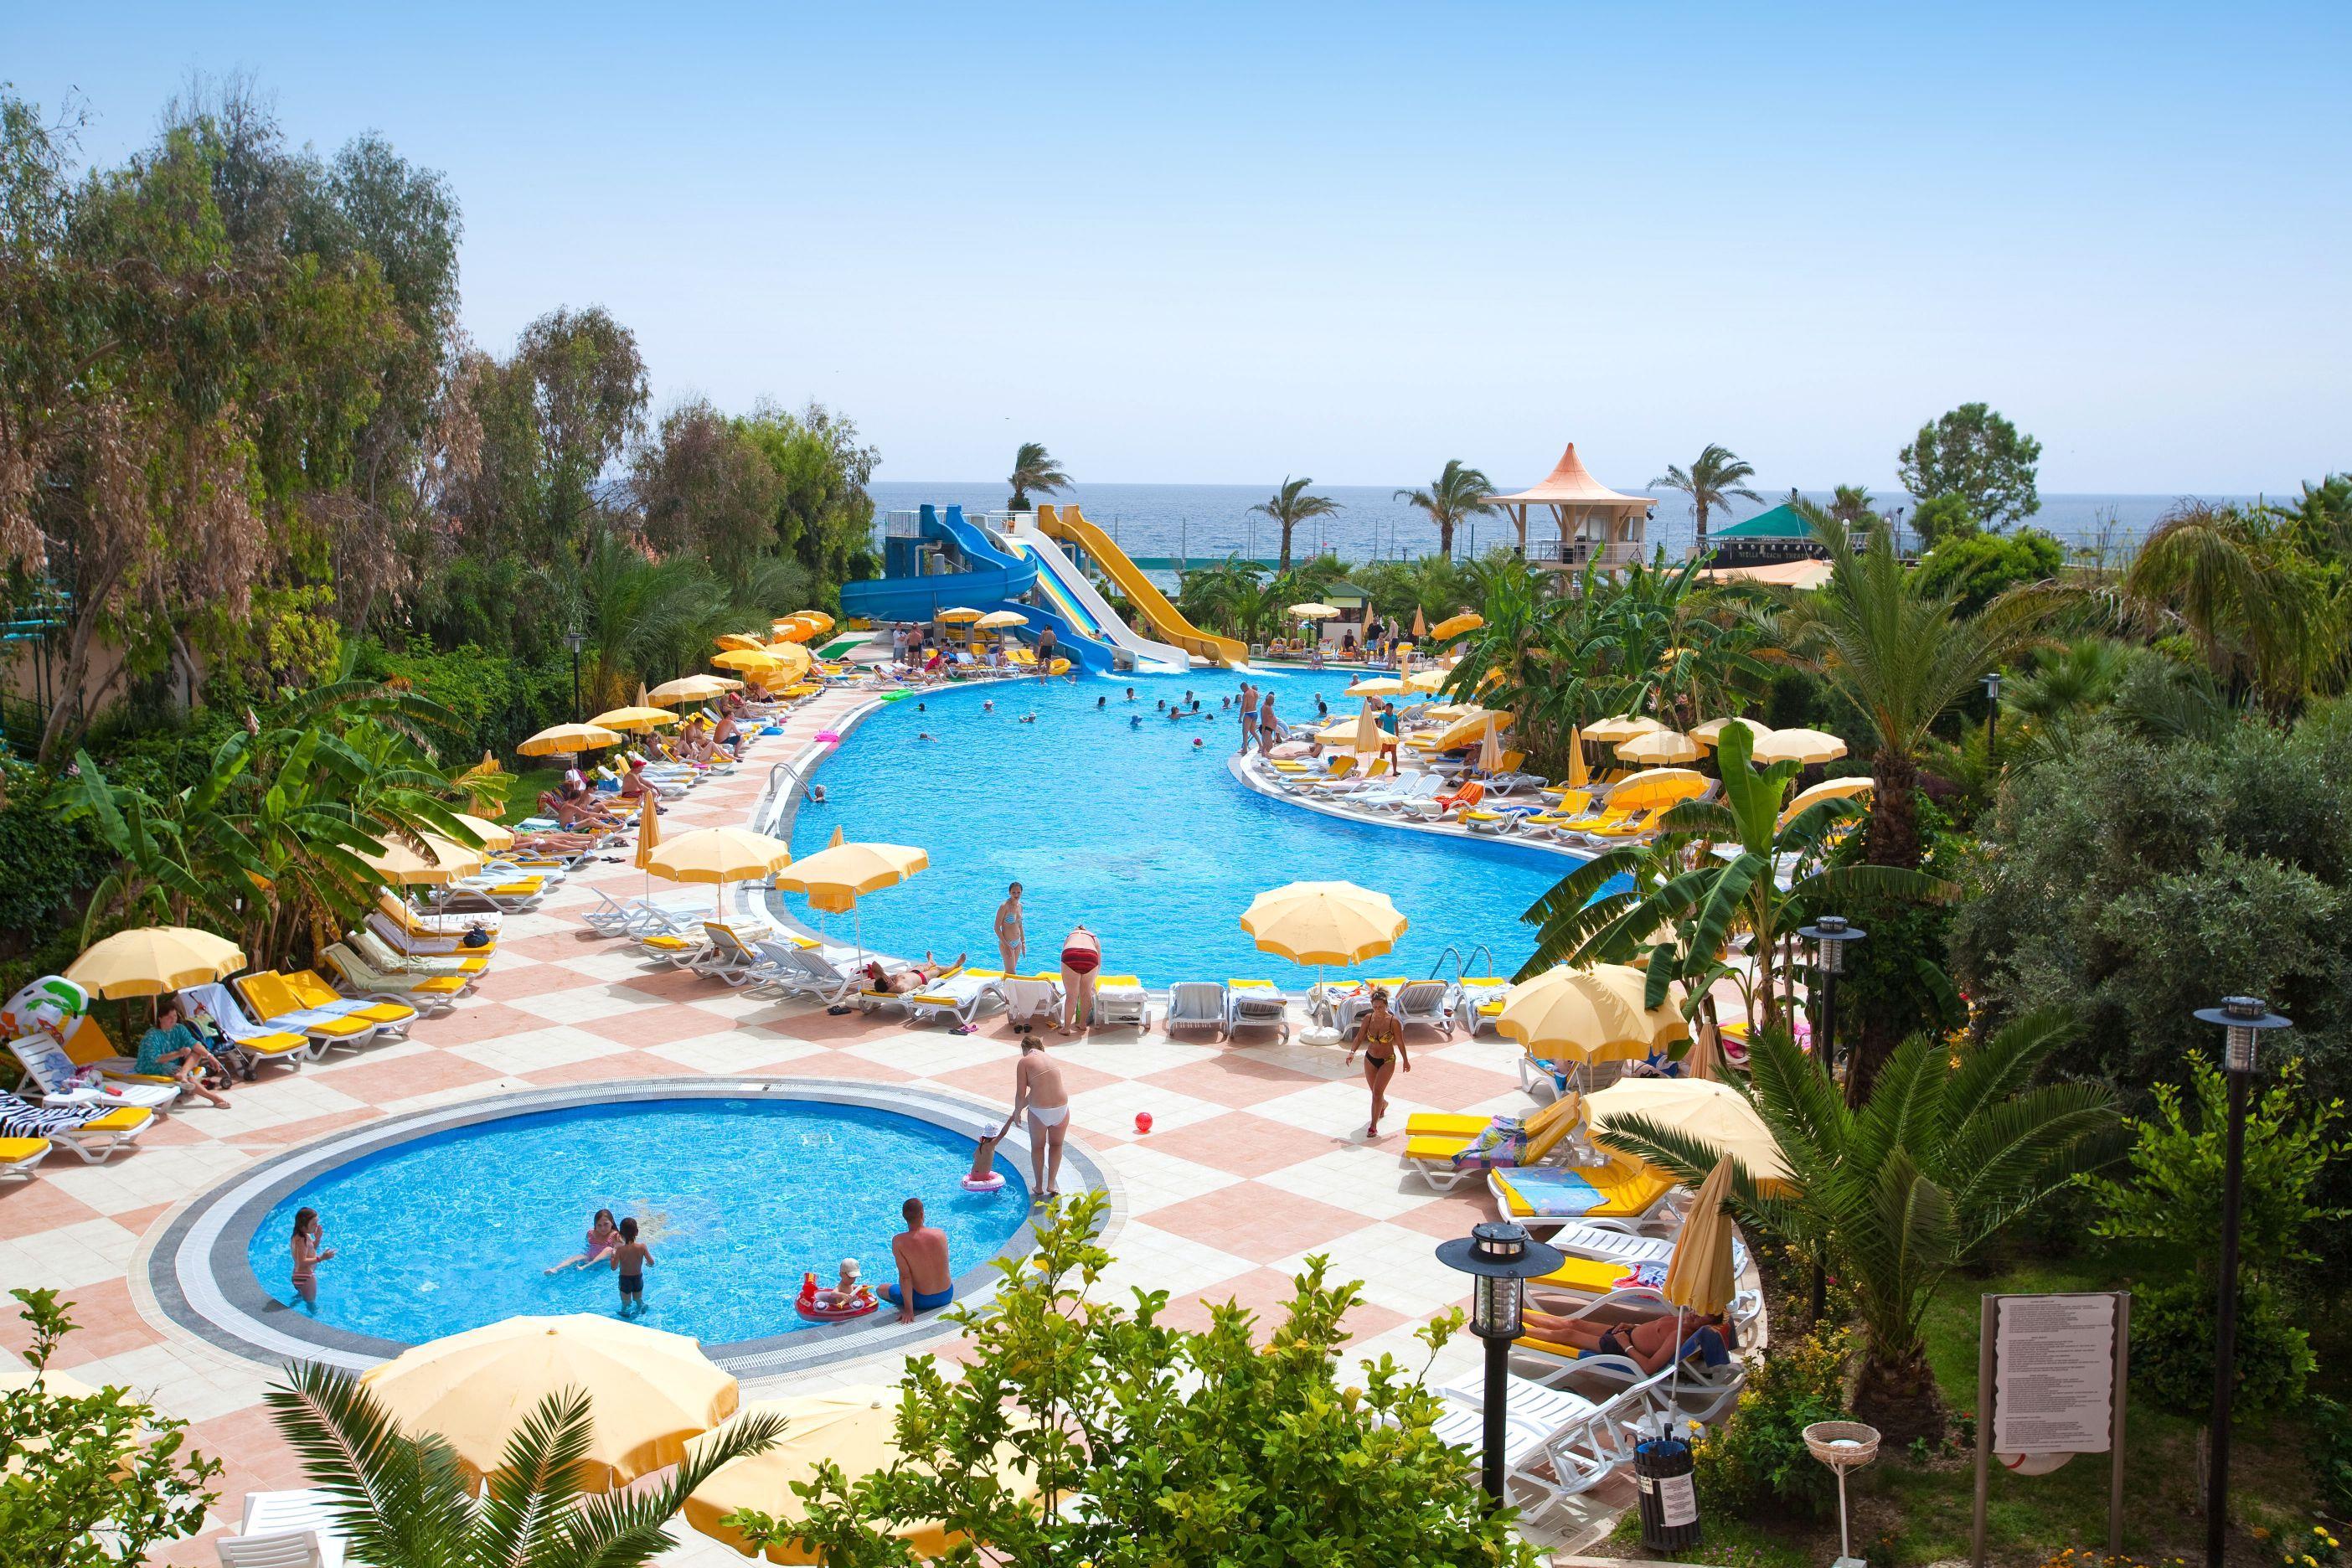 http://www.orextravel.sk/OREX/hotelphotos/stella-beach-hotel-alanya-general-0014.jpg